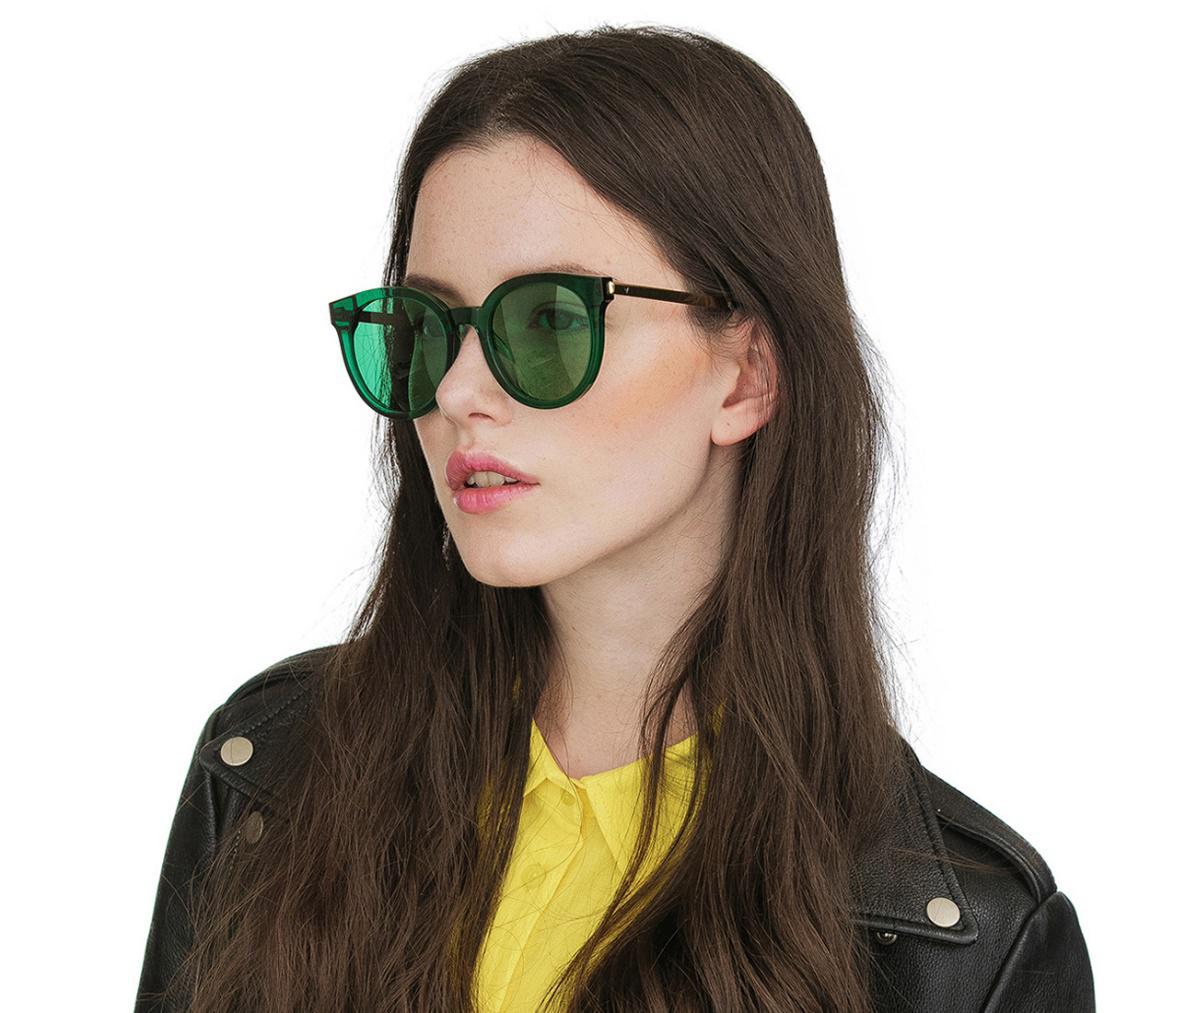 GENTLE MONSTER墨镜提醒:劣质墨镜会引起白内障 角膜损伤